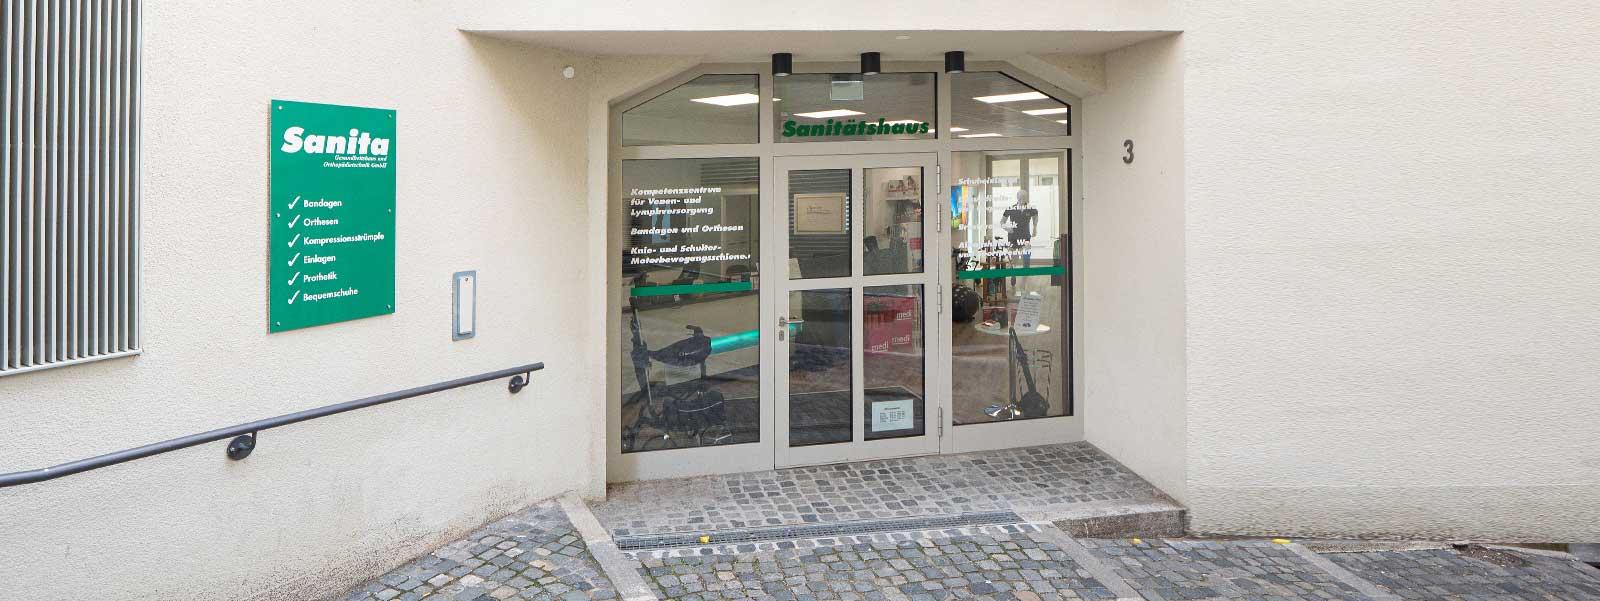 Kontakt ztum Sanita Gesundheitshaus in Augsburg